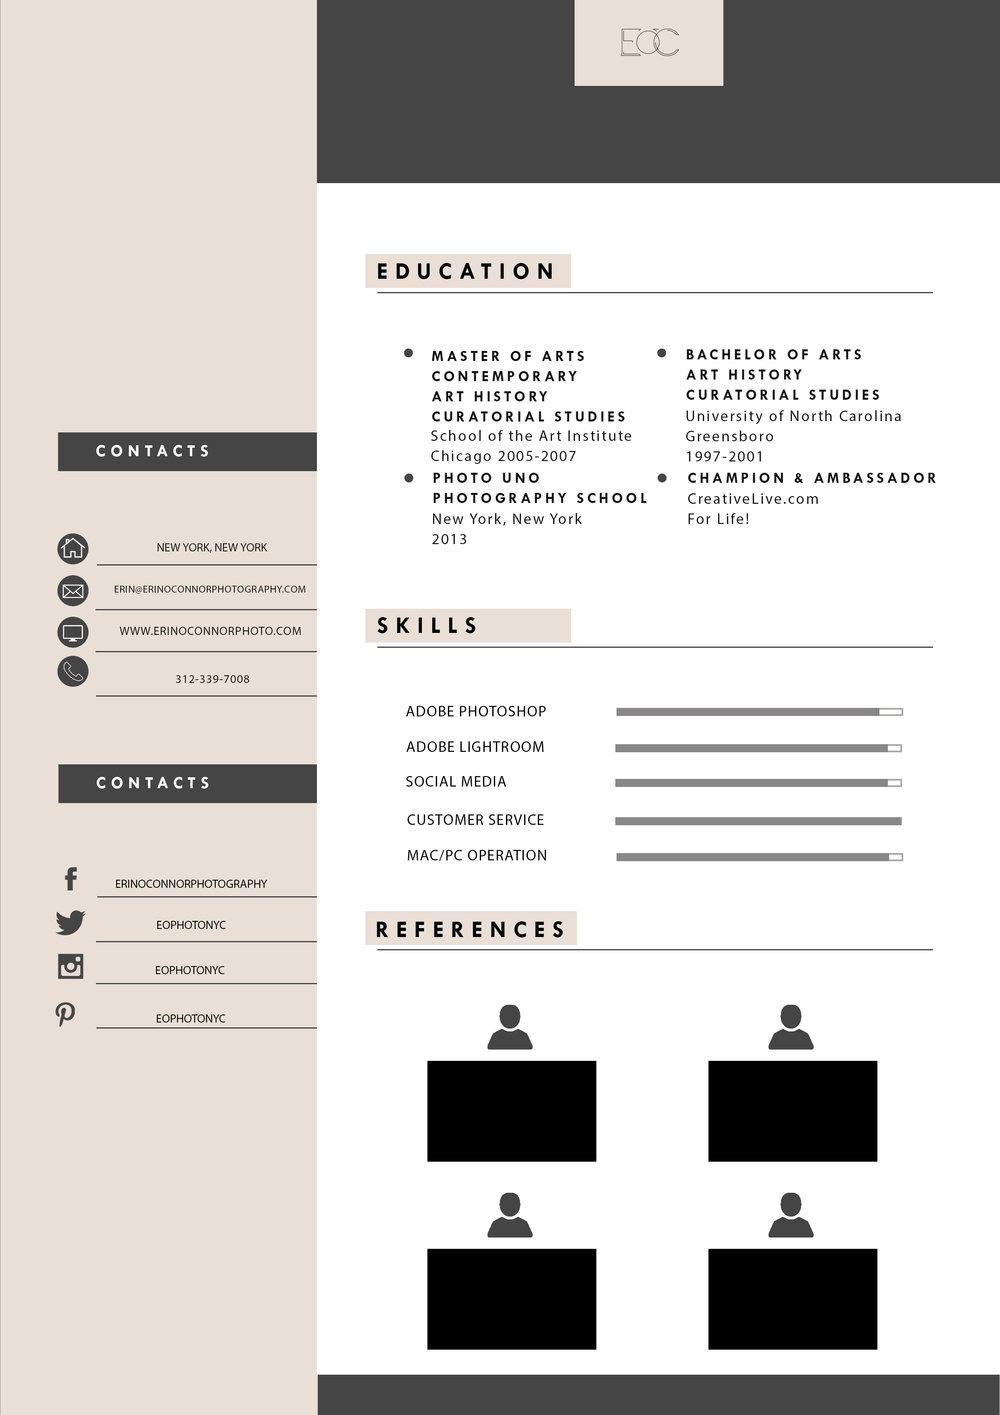 Resume-eophotonyc-2of2 copy.jpg